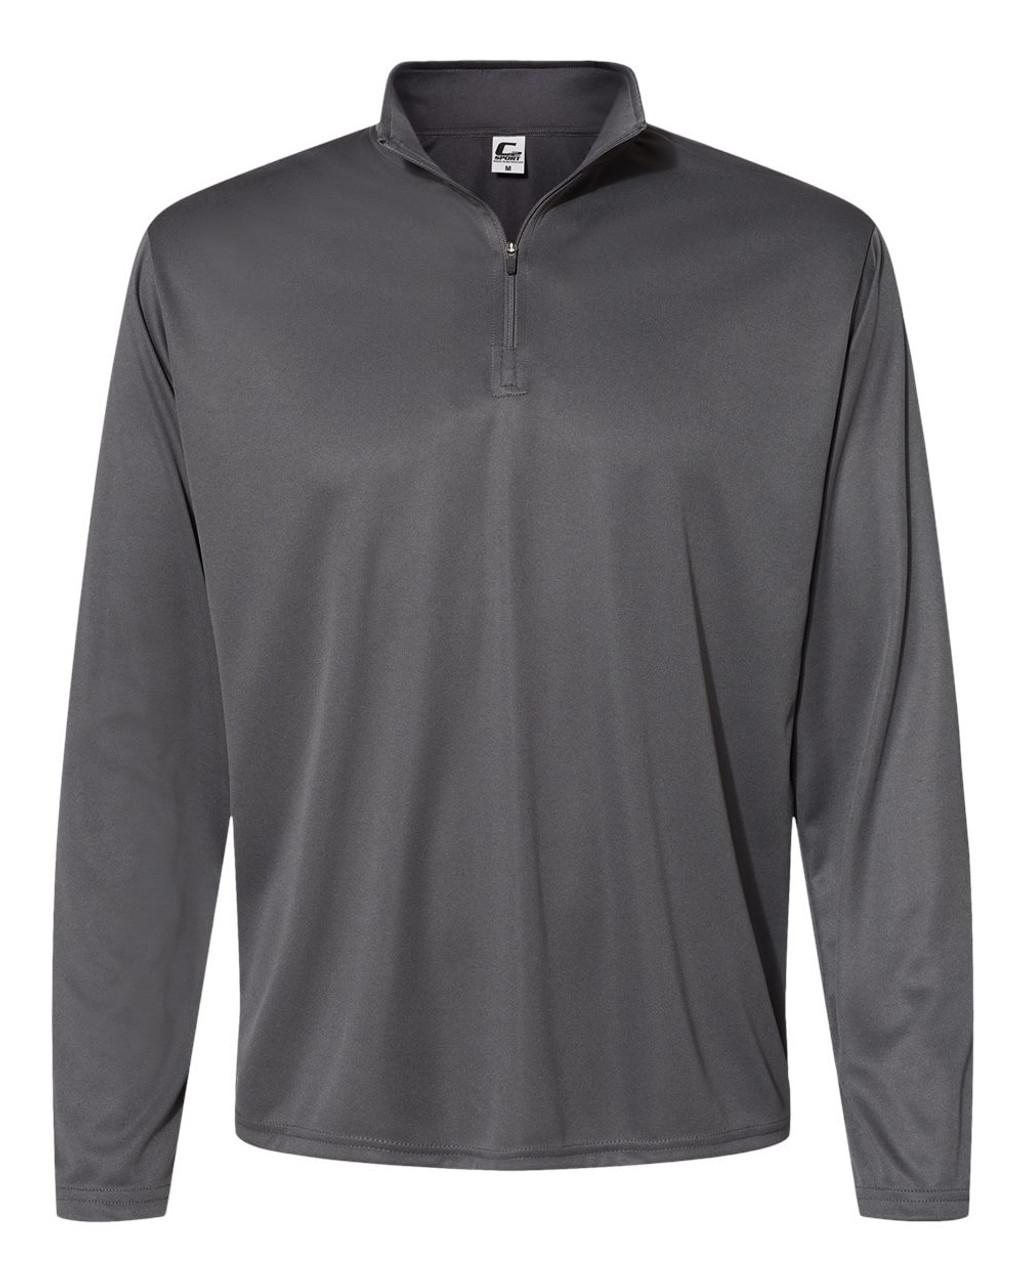 5102 C2 Sport Quarter-Zip Pullover Sweatshirt | T-shirt.ca